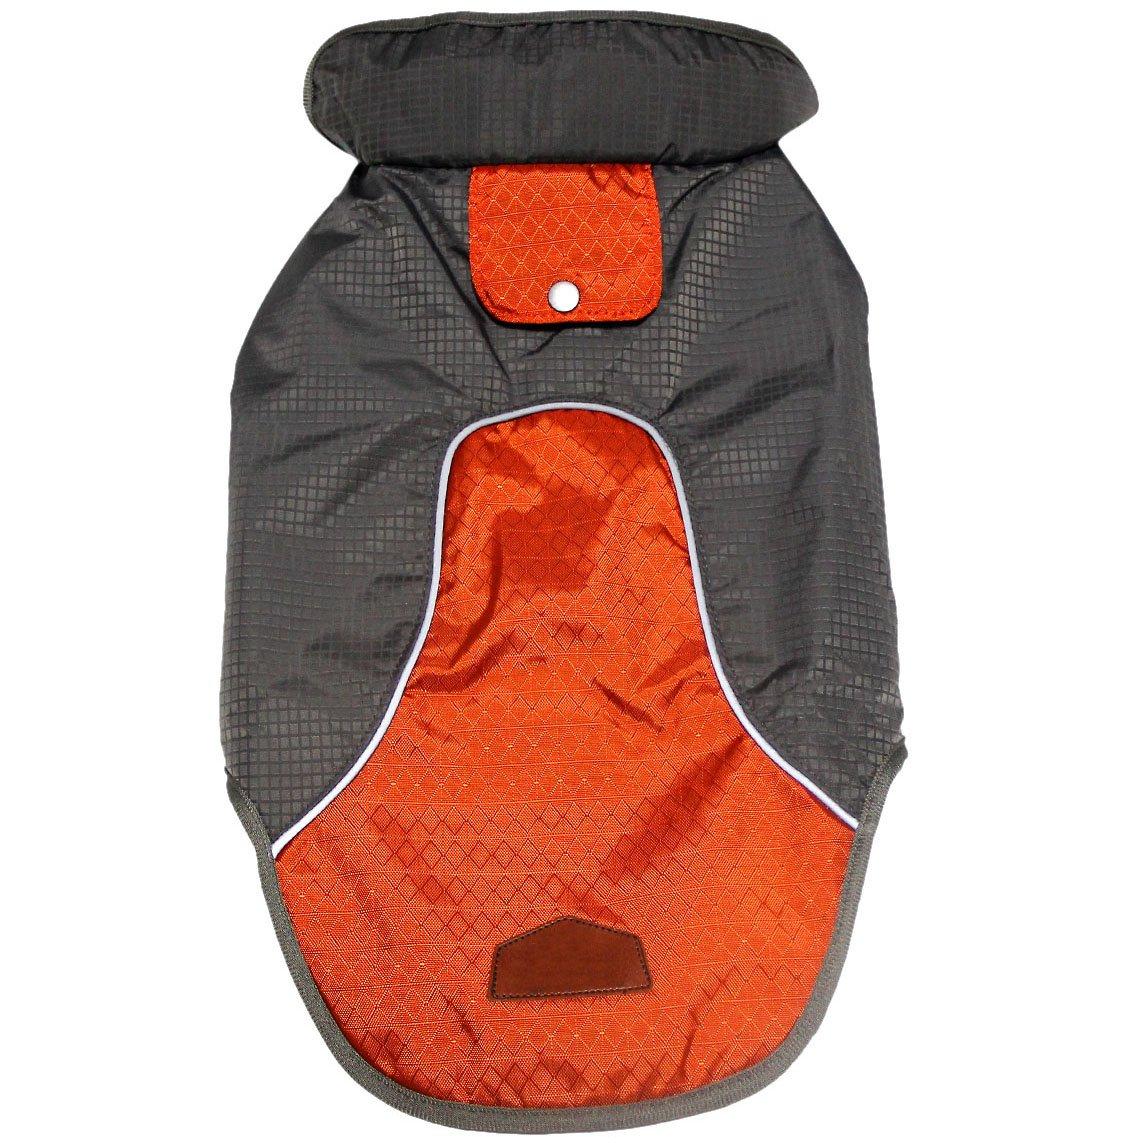 JoyDaog Premium Outdoor Sport Waterproof Raincoat Dog Jacket,Super Breathable Mesh Lined Dog Coats for Small Dogs, Orange L by JoyDaog